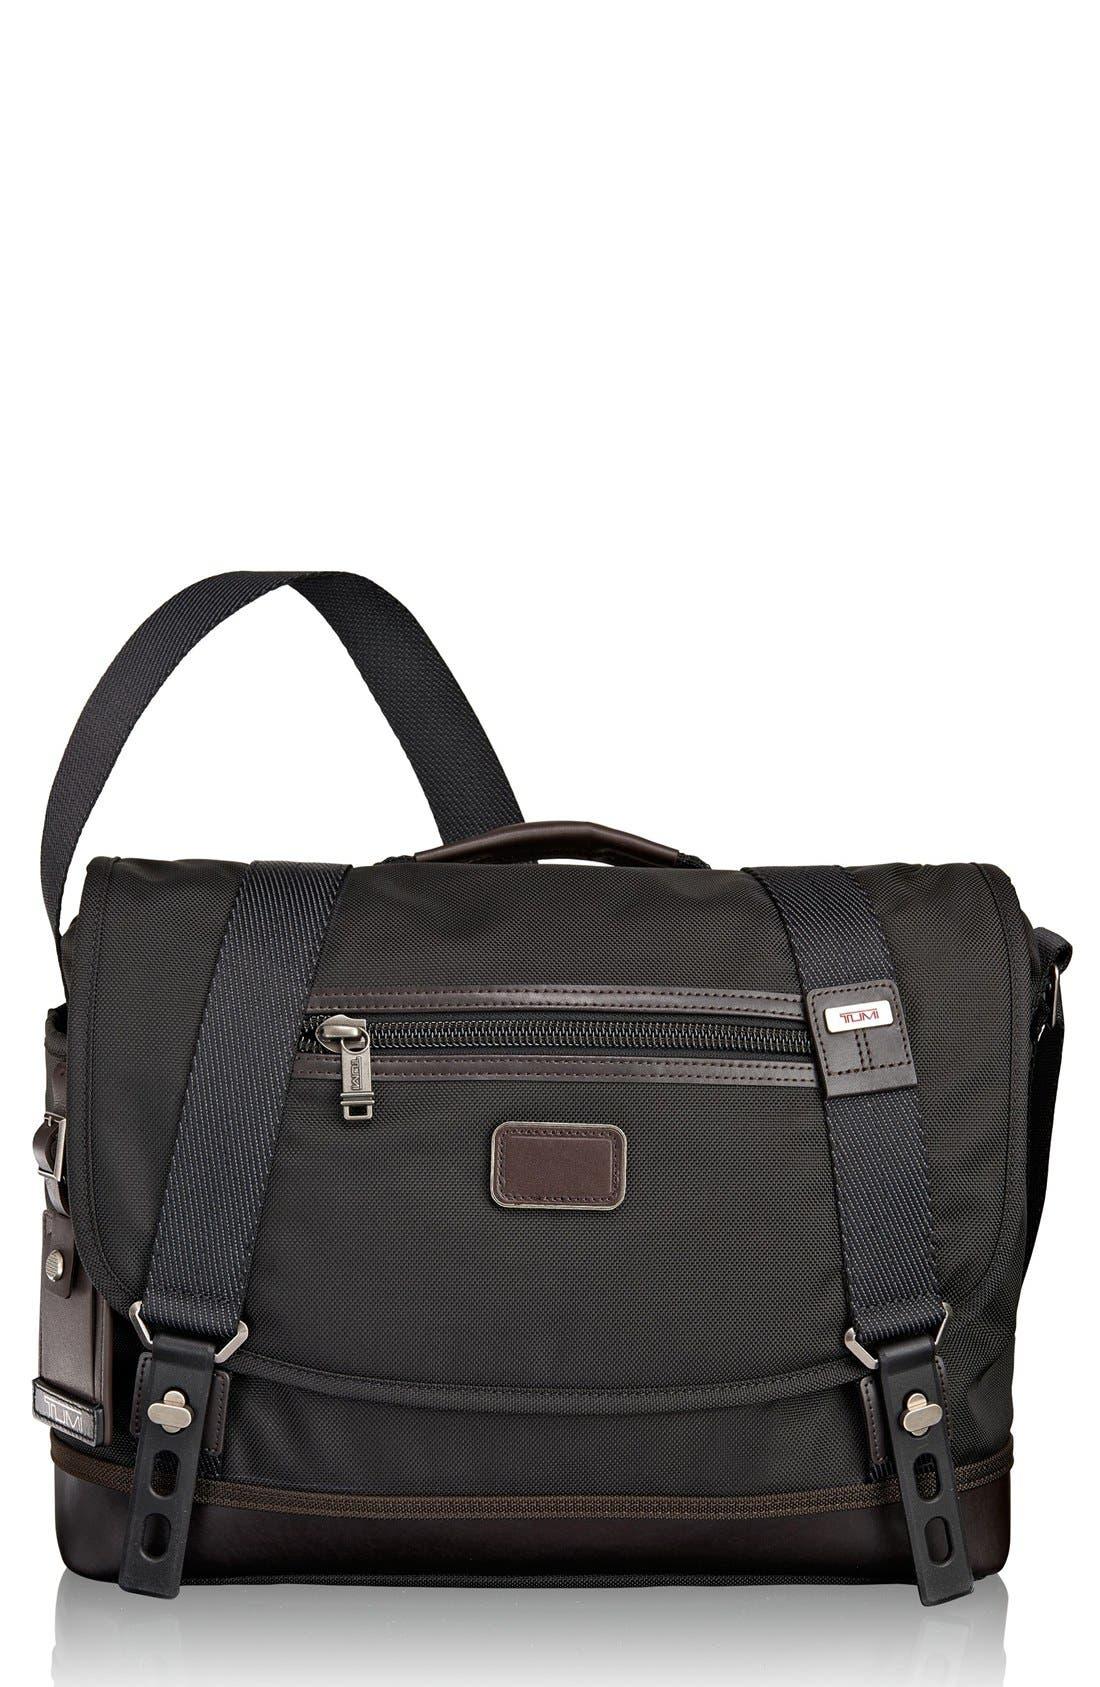 'Alpha Bravo - Foster' Messenger Bag,                             Main thumbnail 1, color,                             001